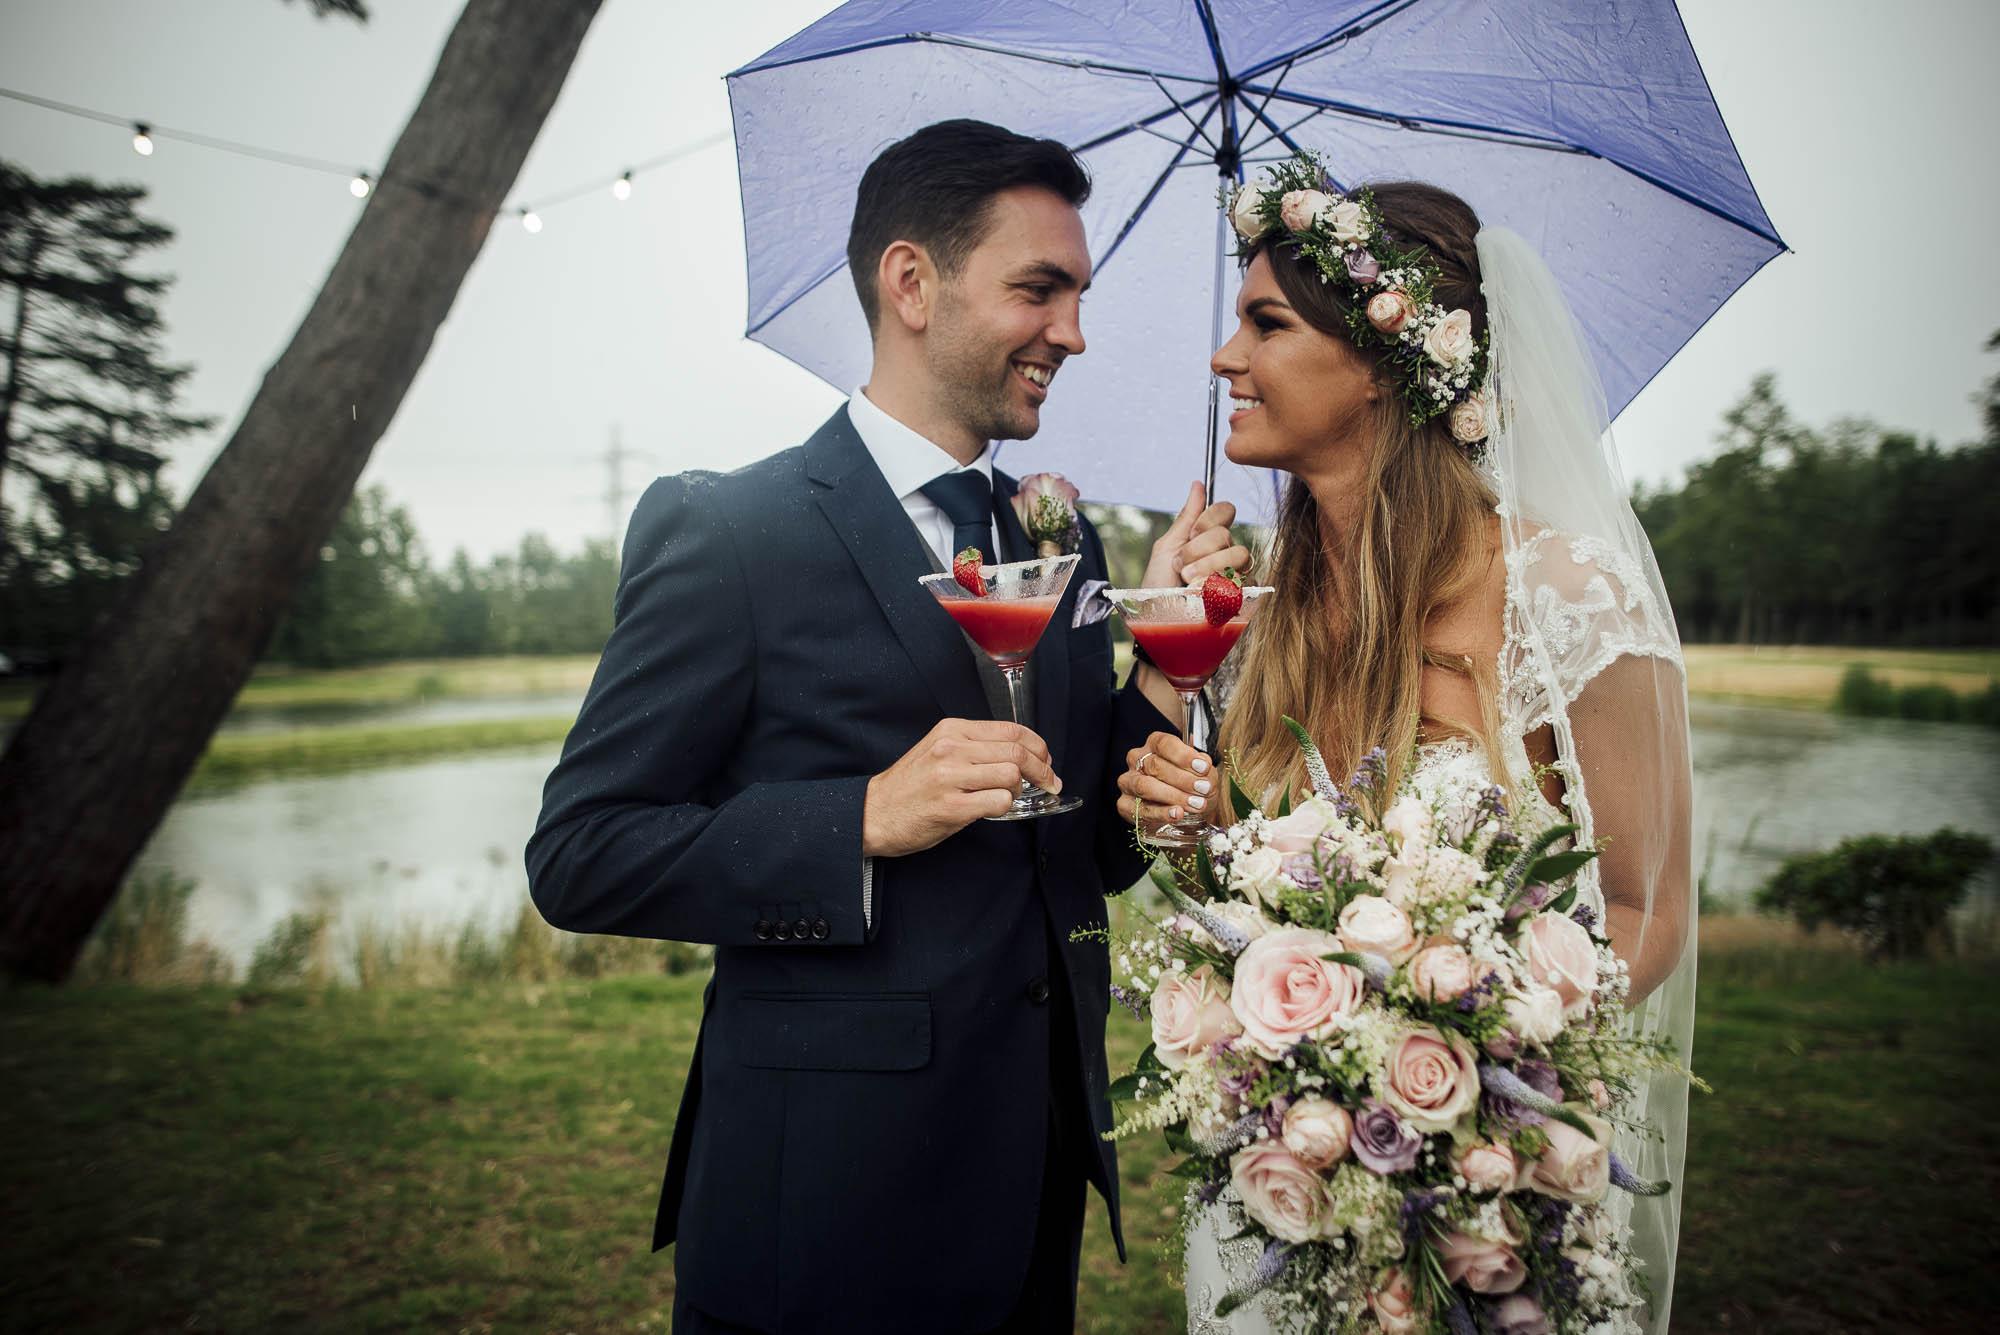 Bride & Groom share a cocktail on their rainy wedding day